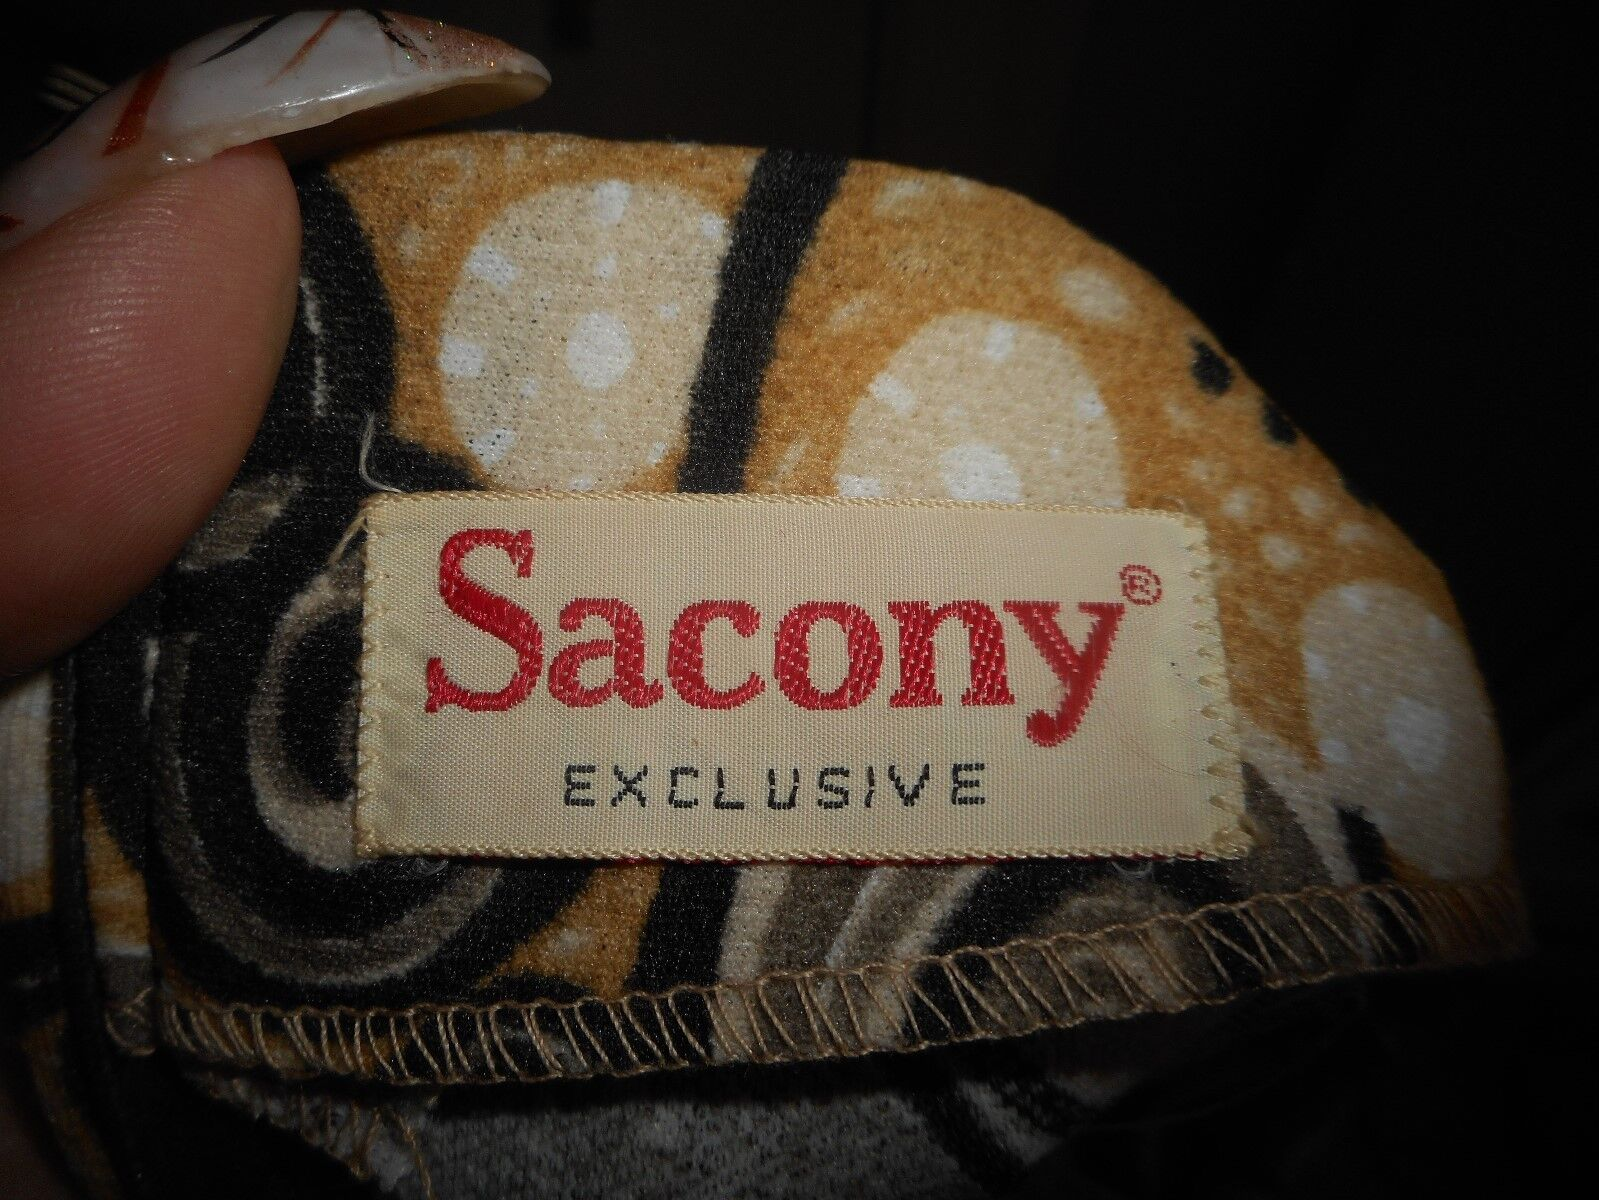 Vintage Sacony Exclusive Dress With Belt - image 5